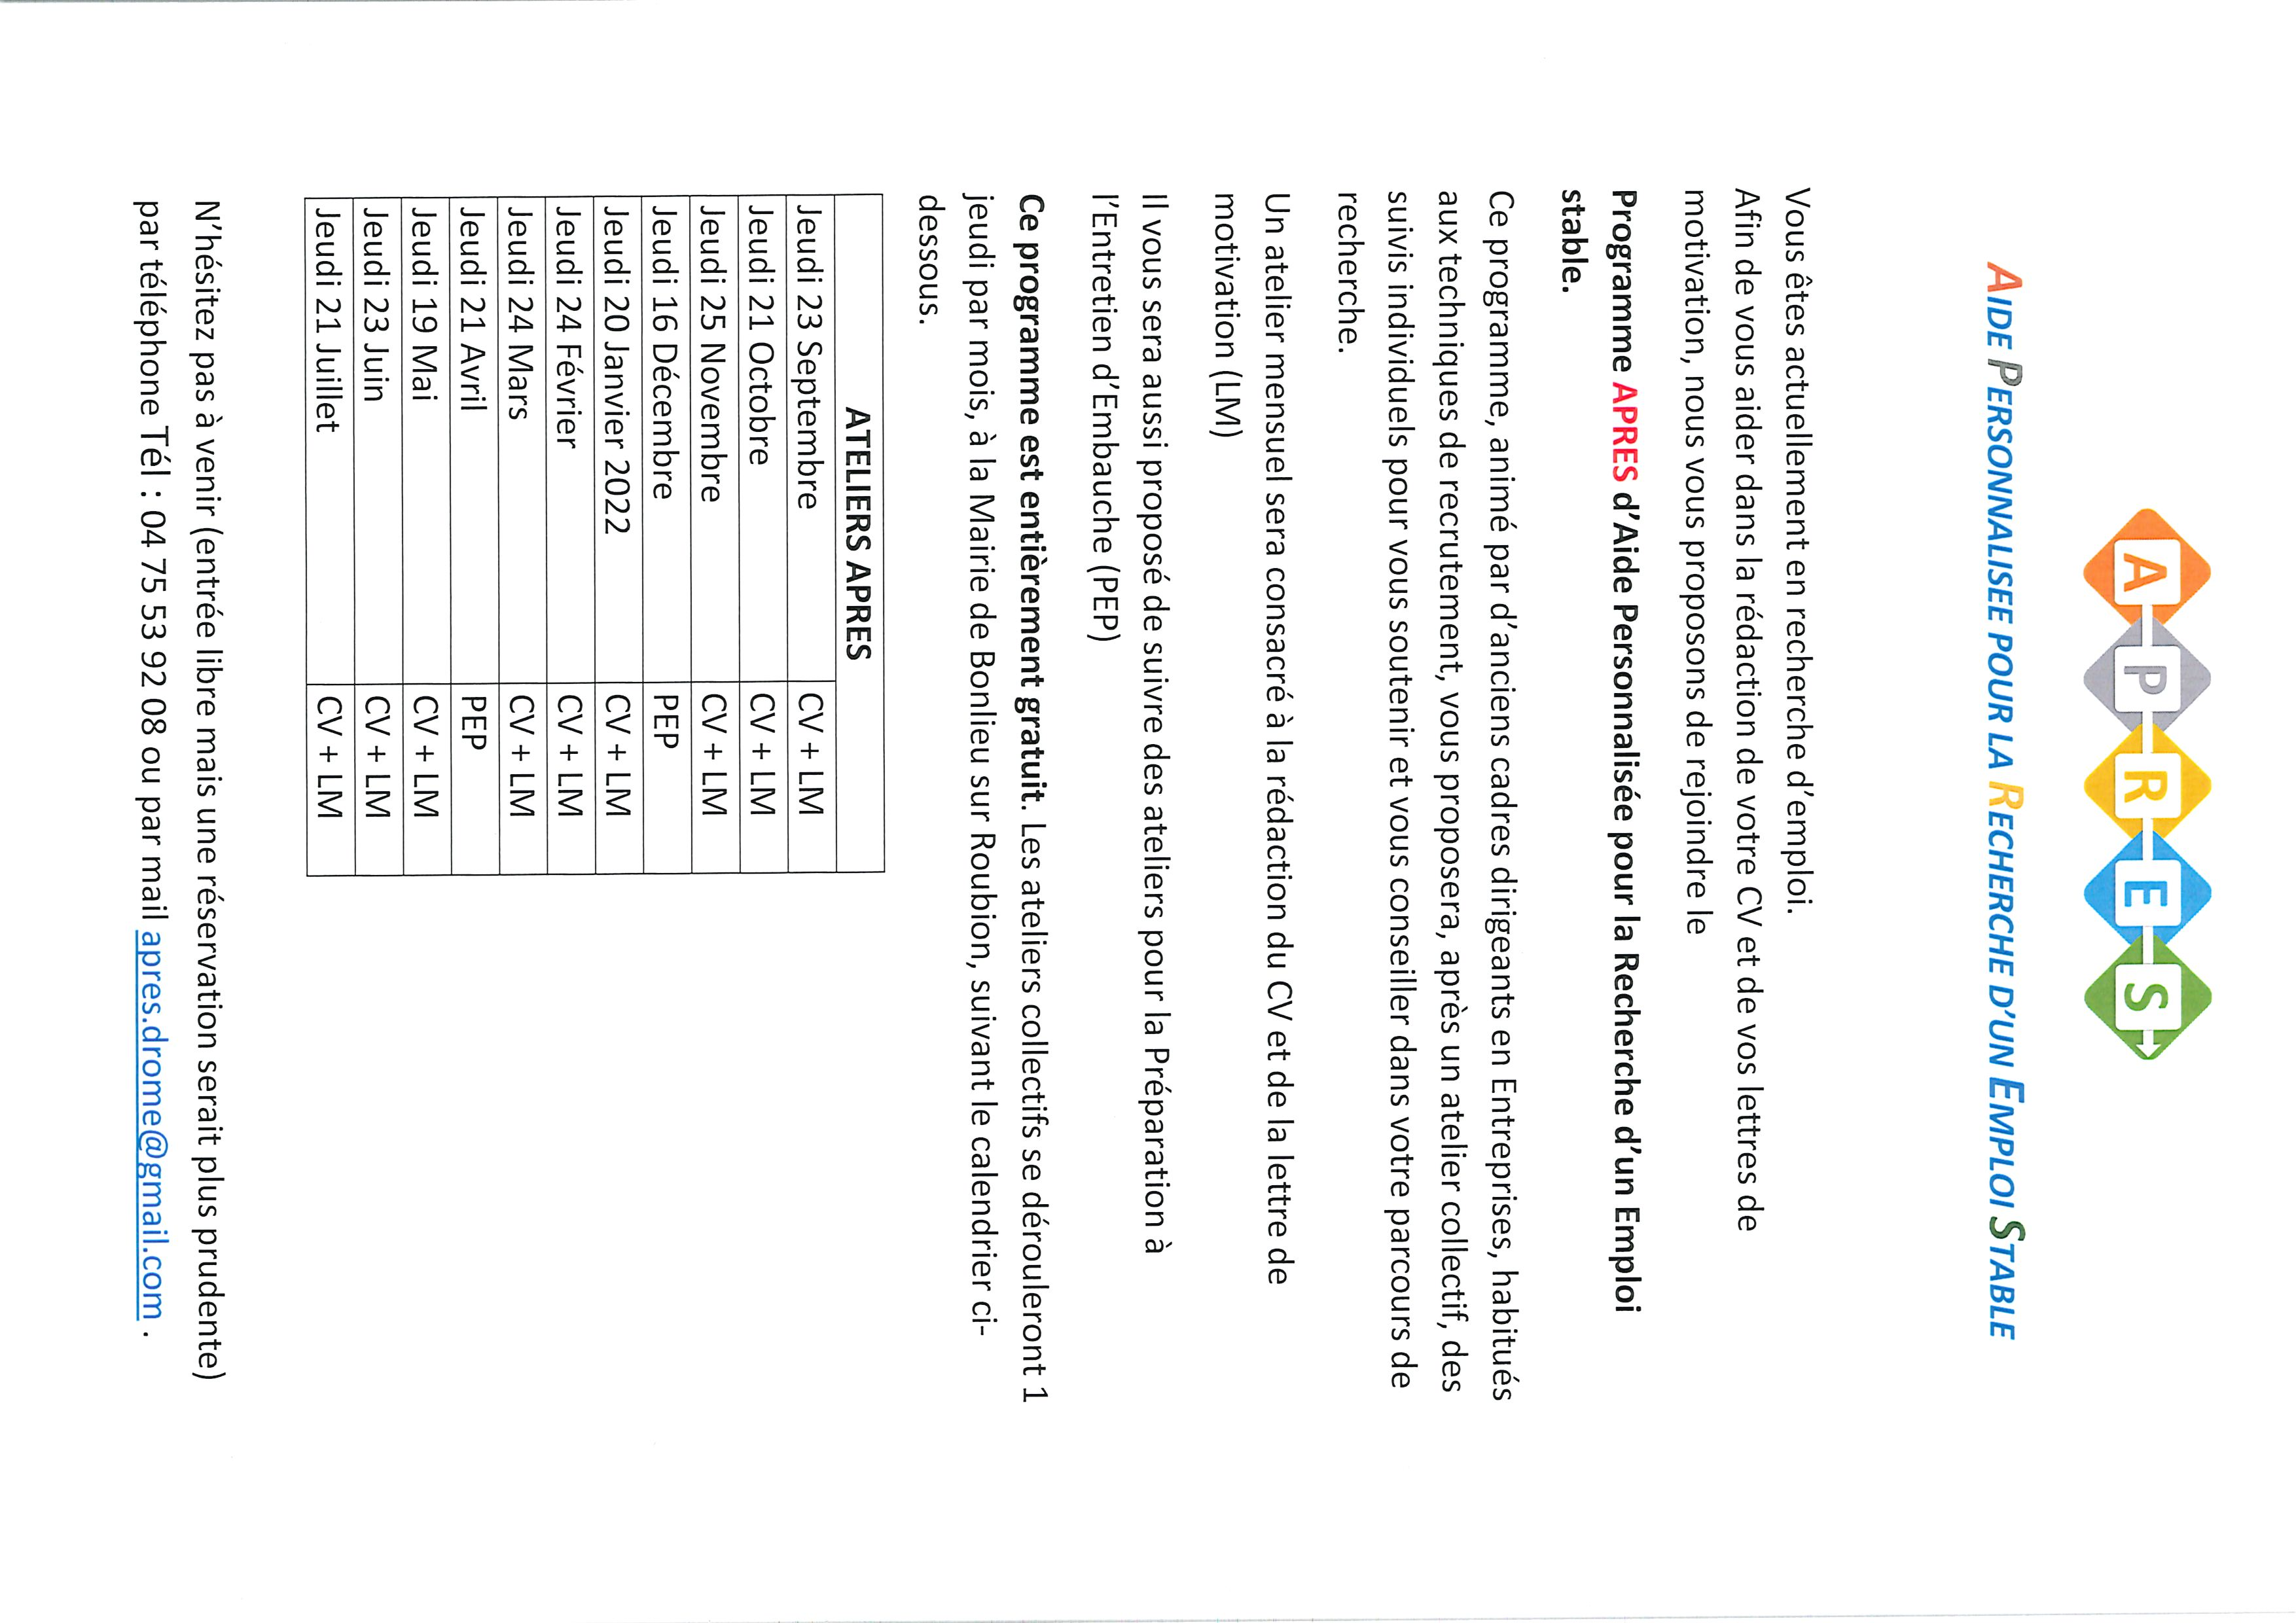 Lancement programme APRES.jpg